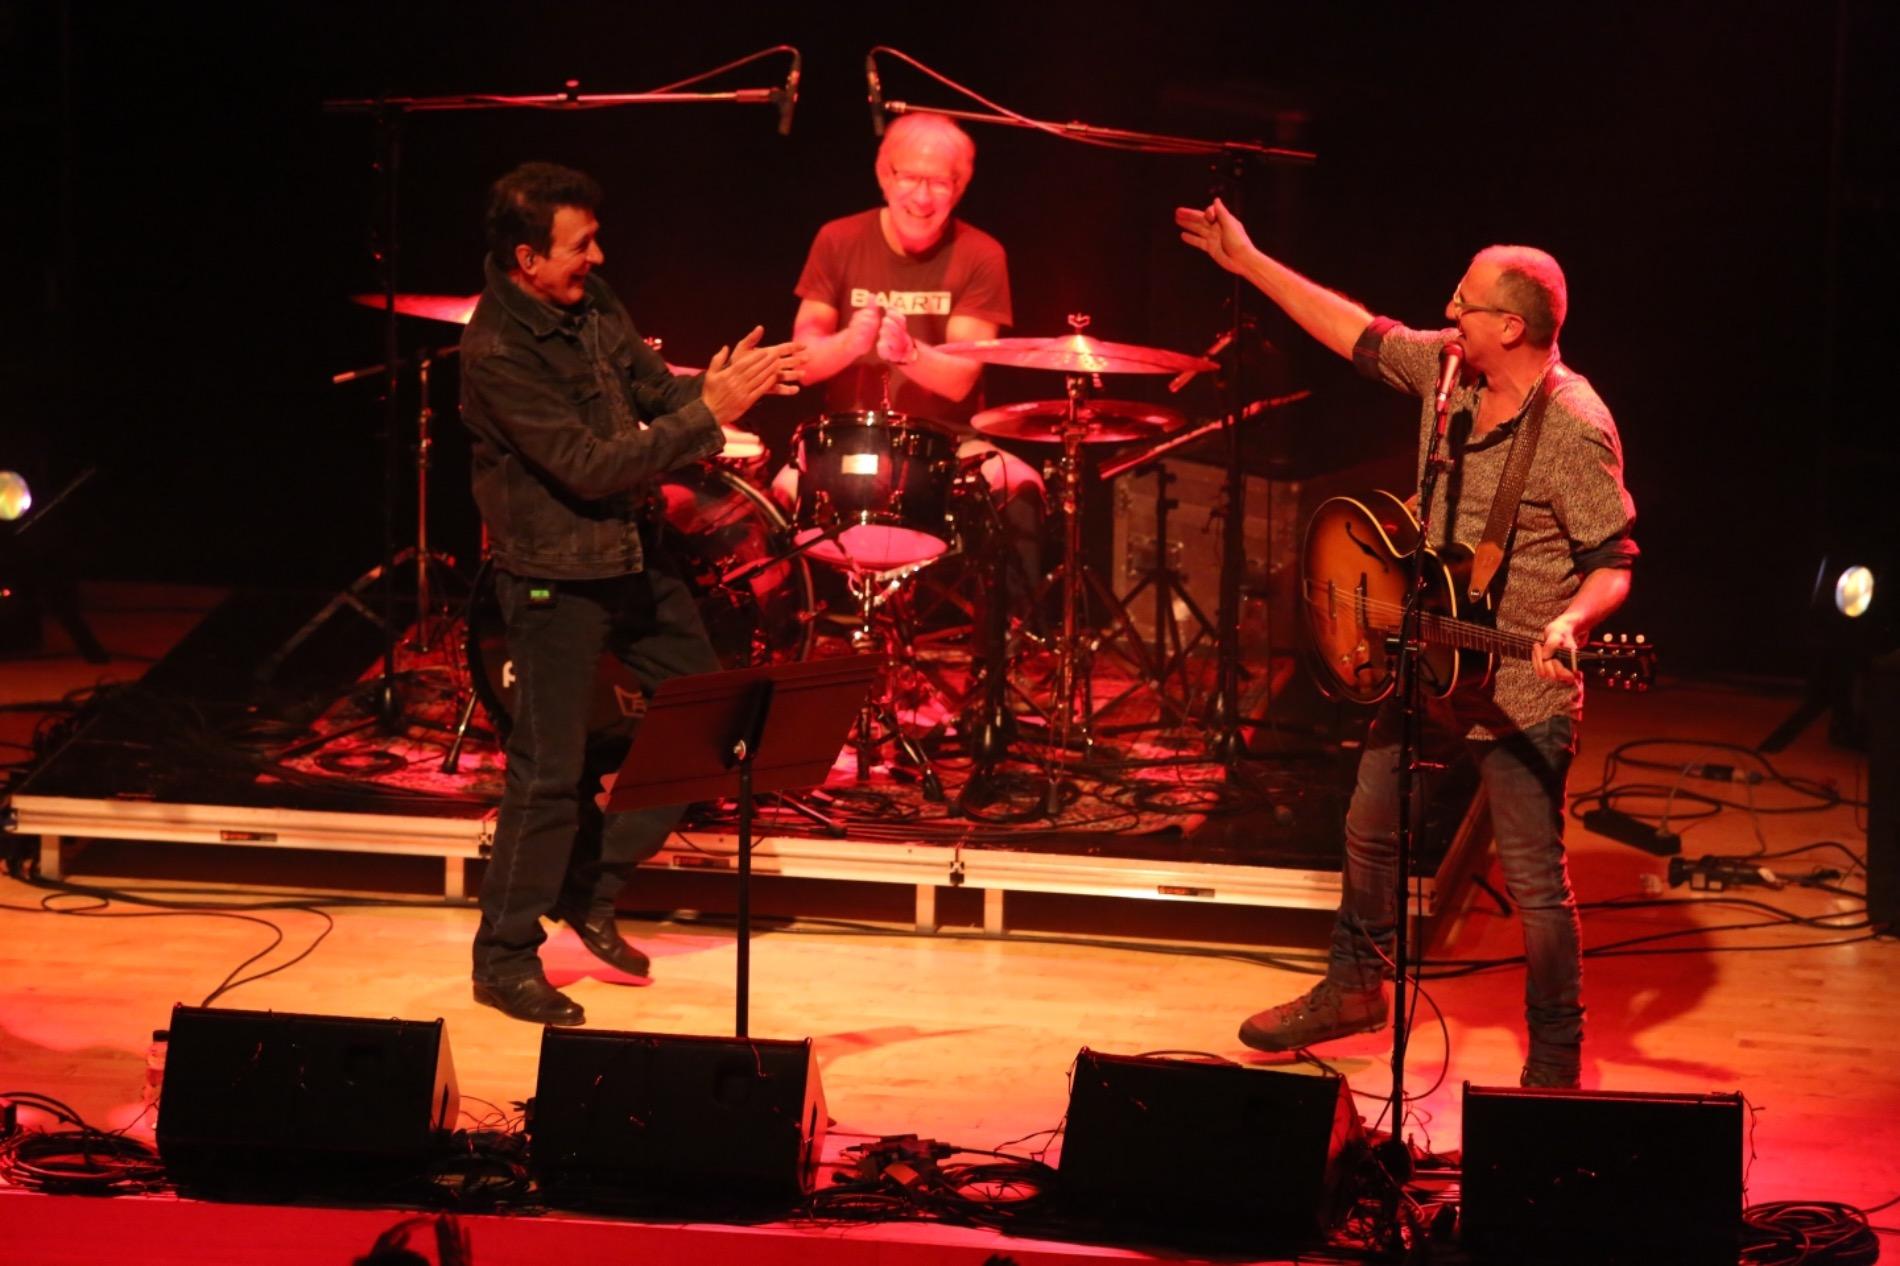 Quimi Portet amb Manolo Garcia, en el concert